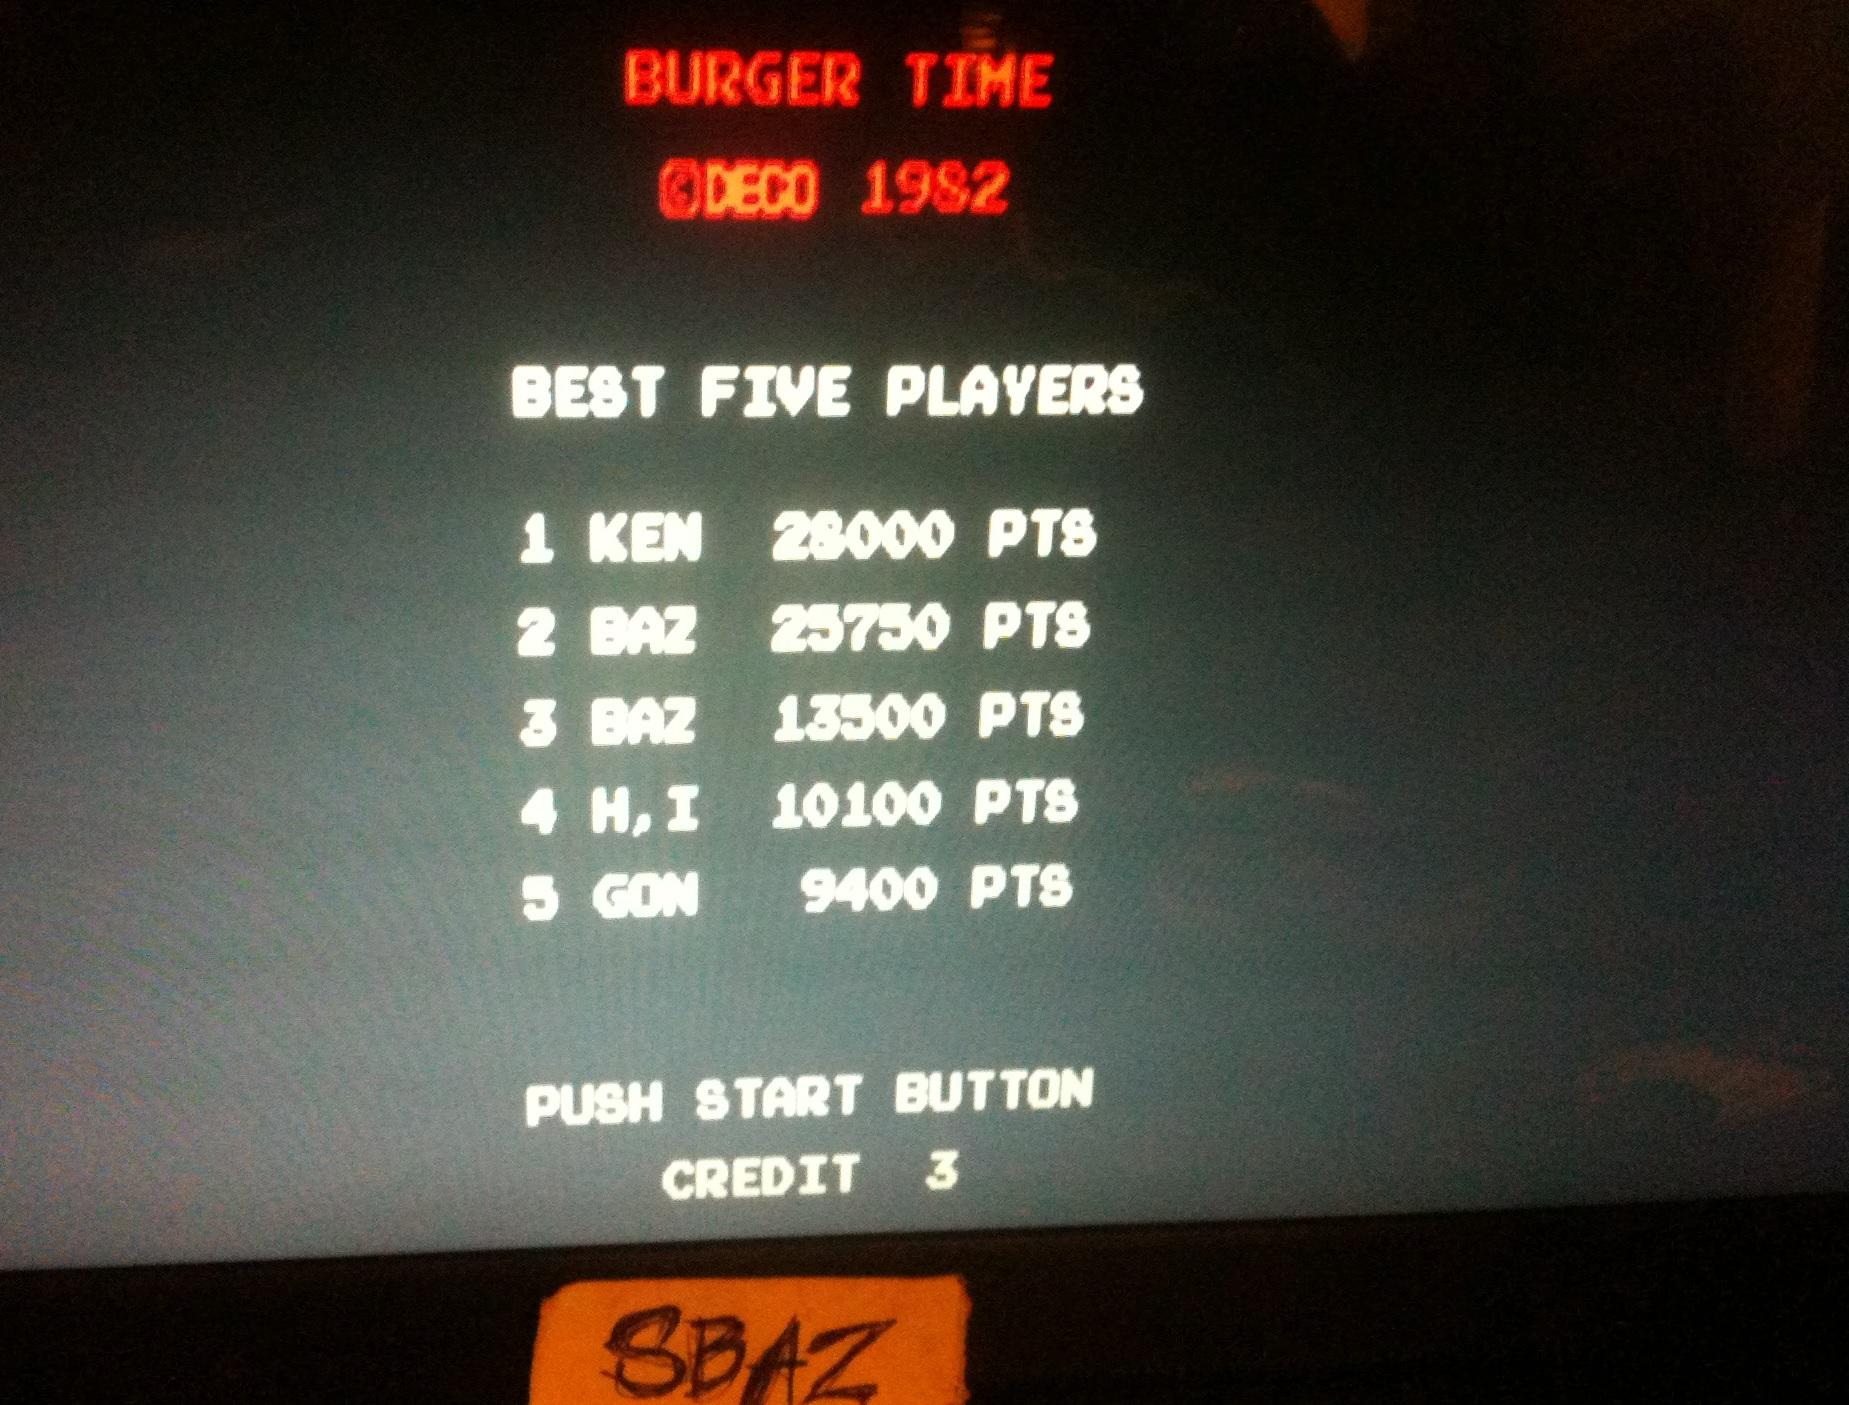 BurgerTime 25,750 points